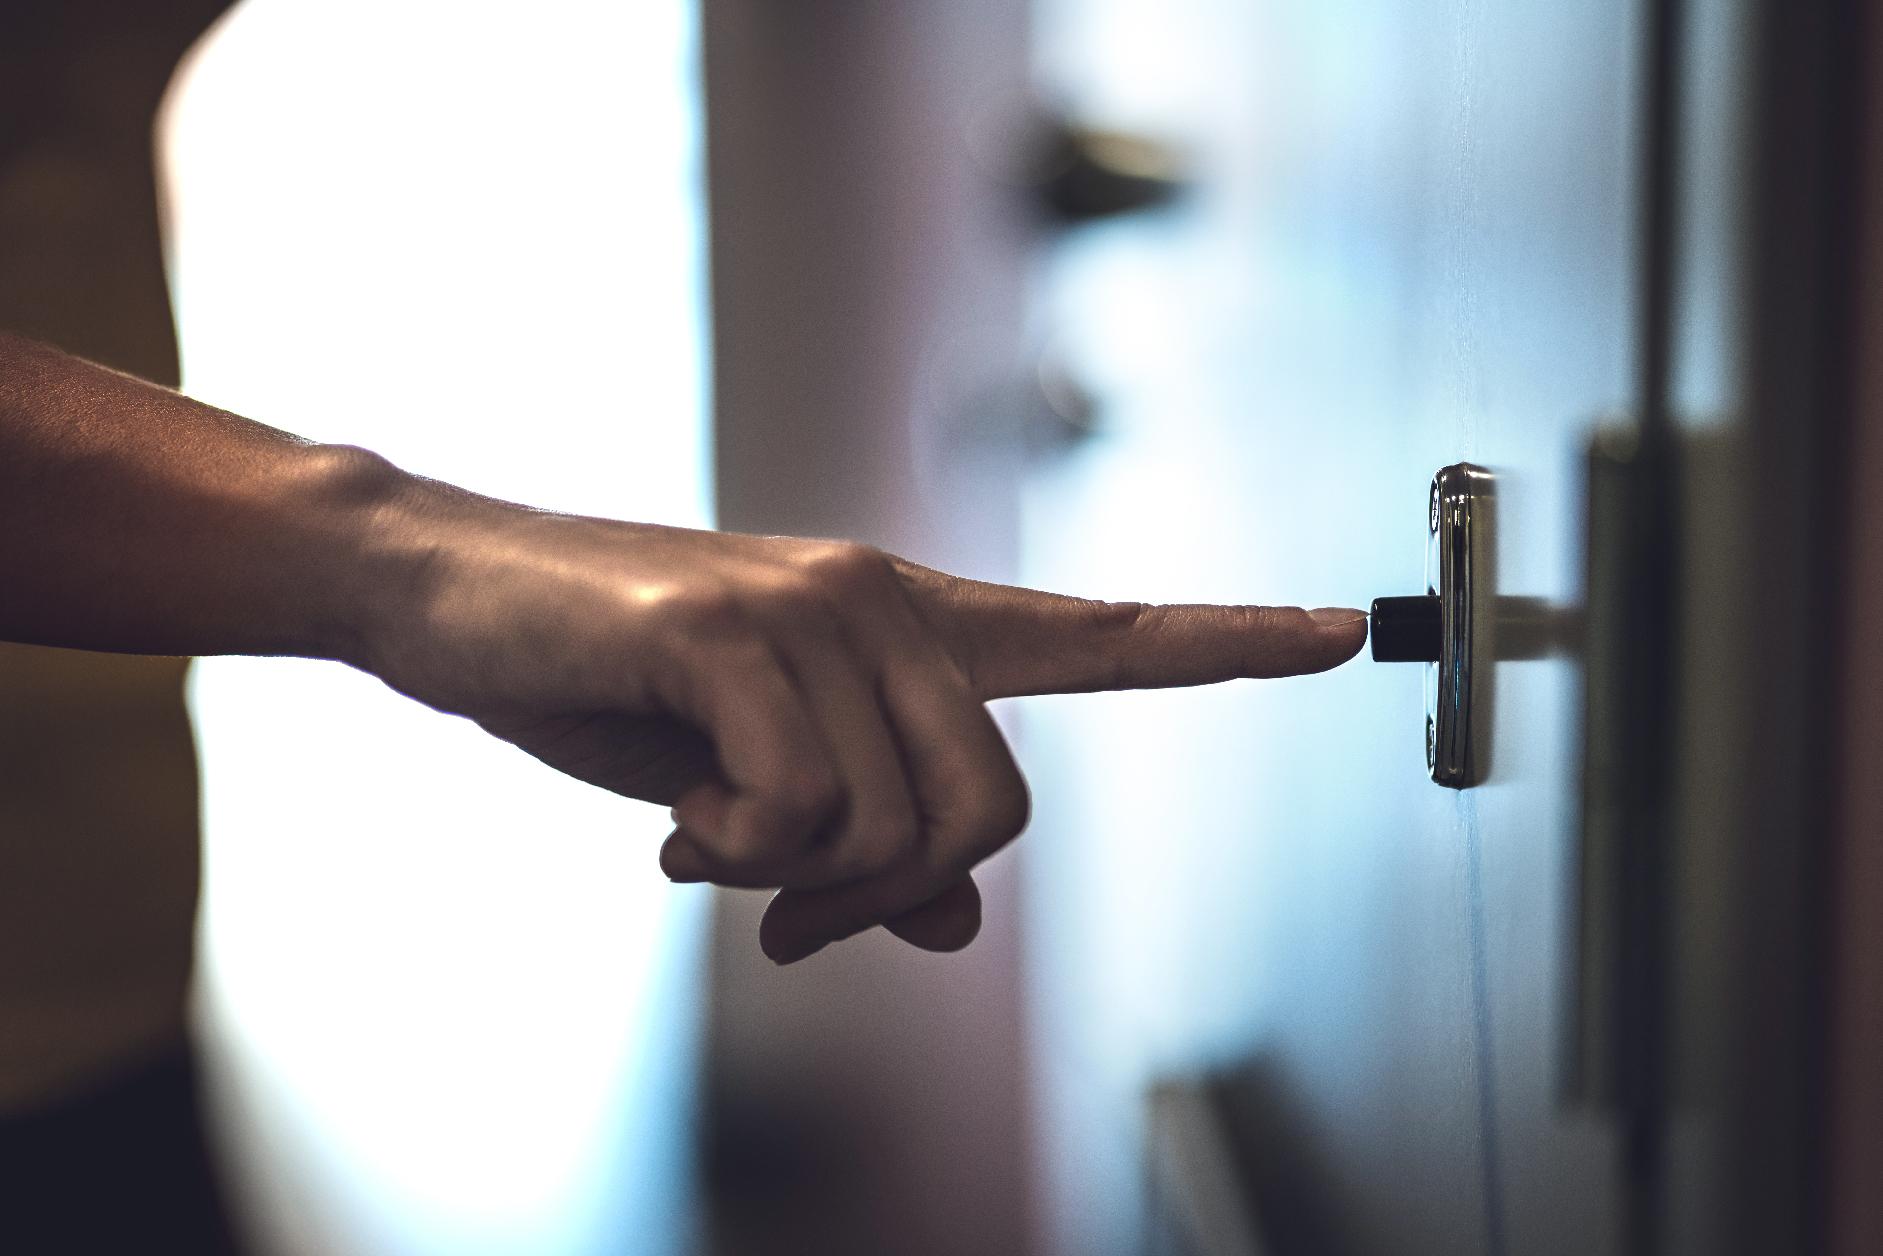 Hand ringing doorbell